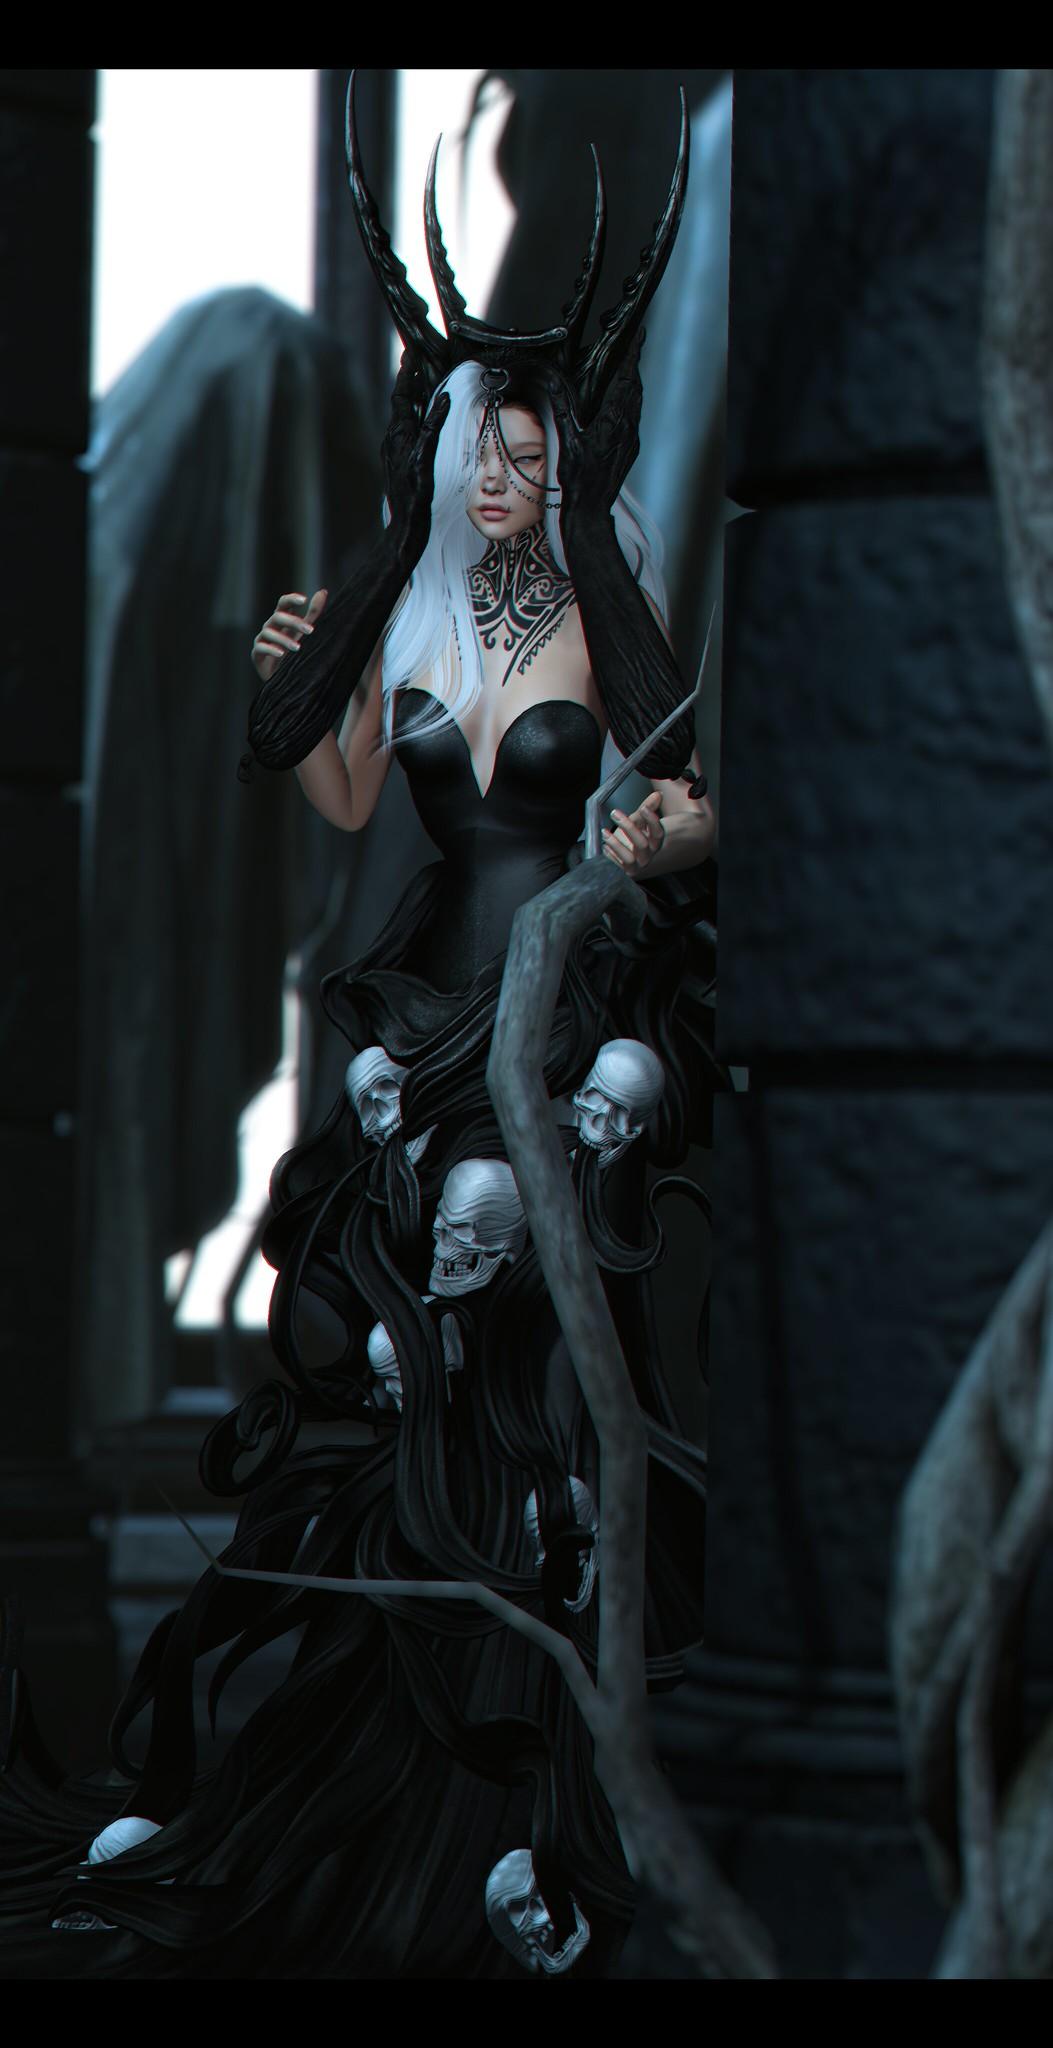 The Coronation of the Underworld